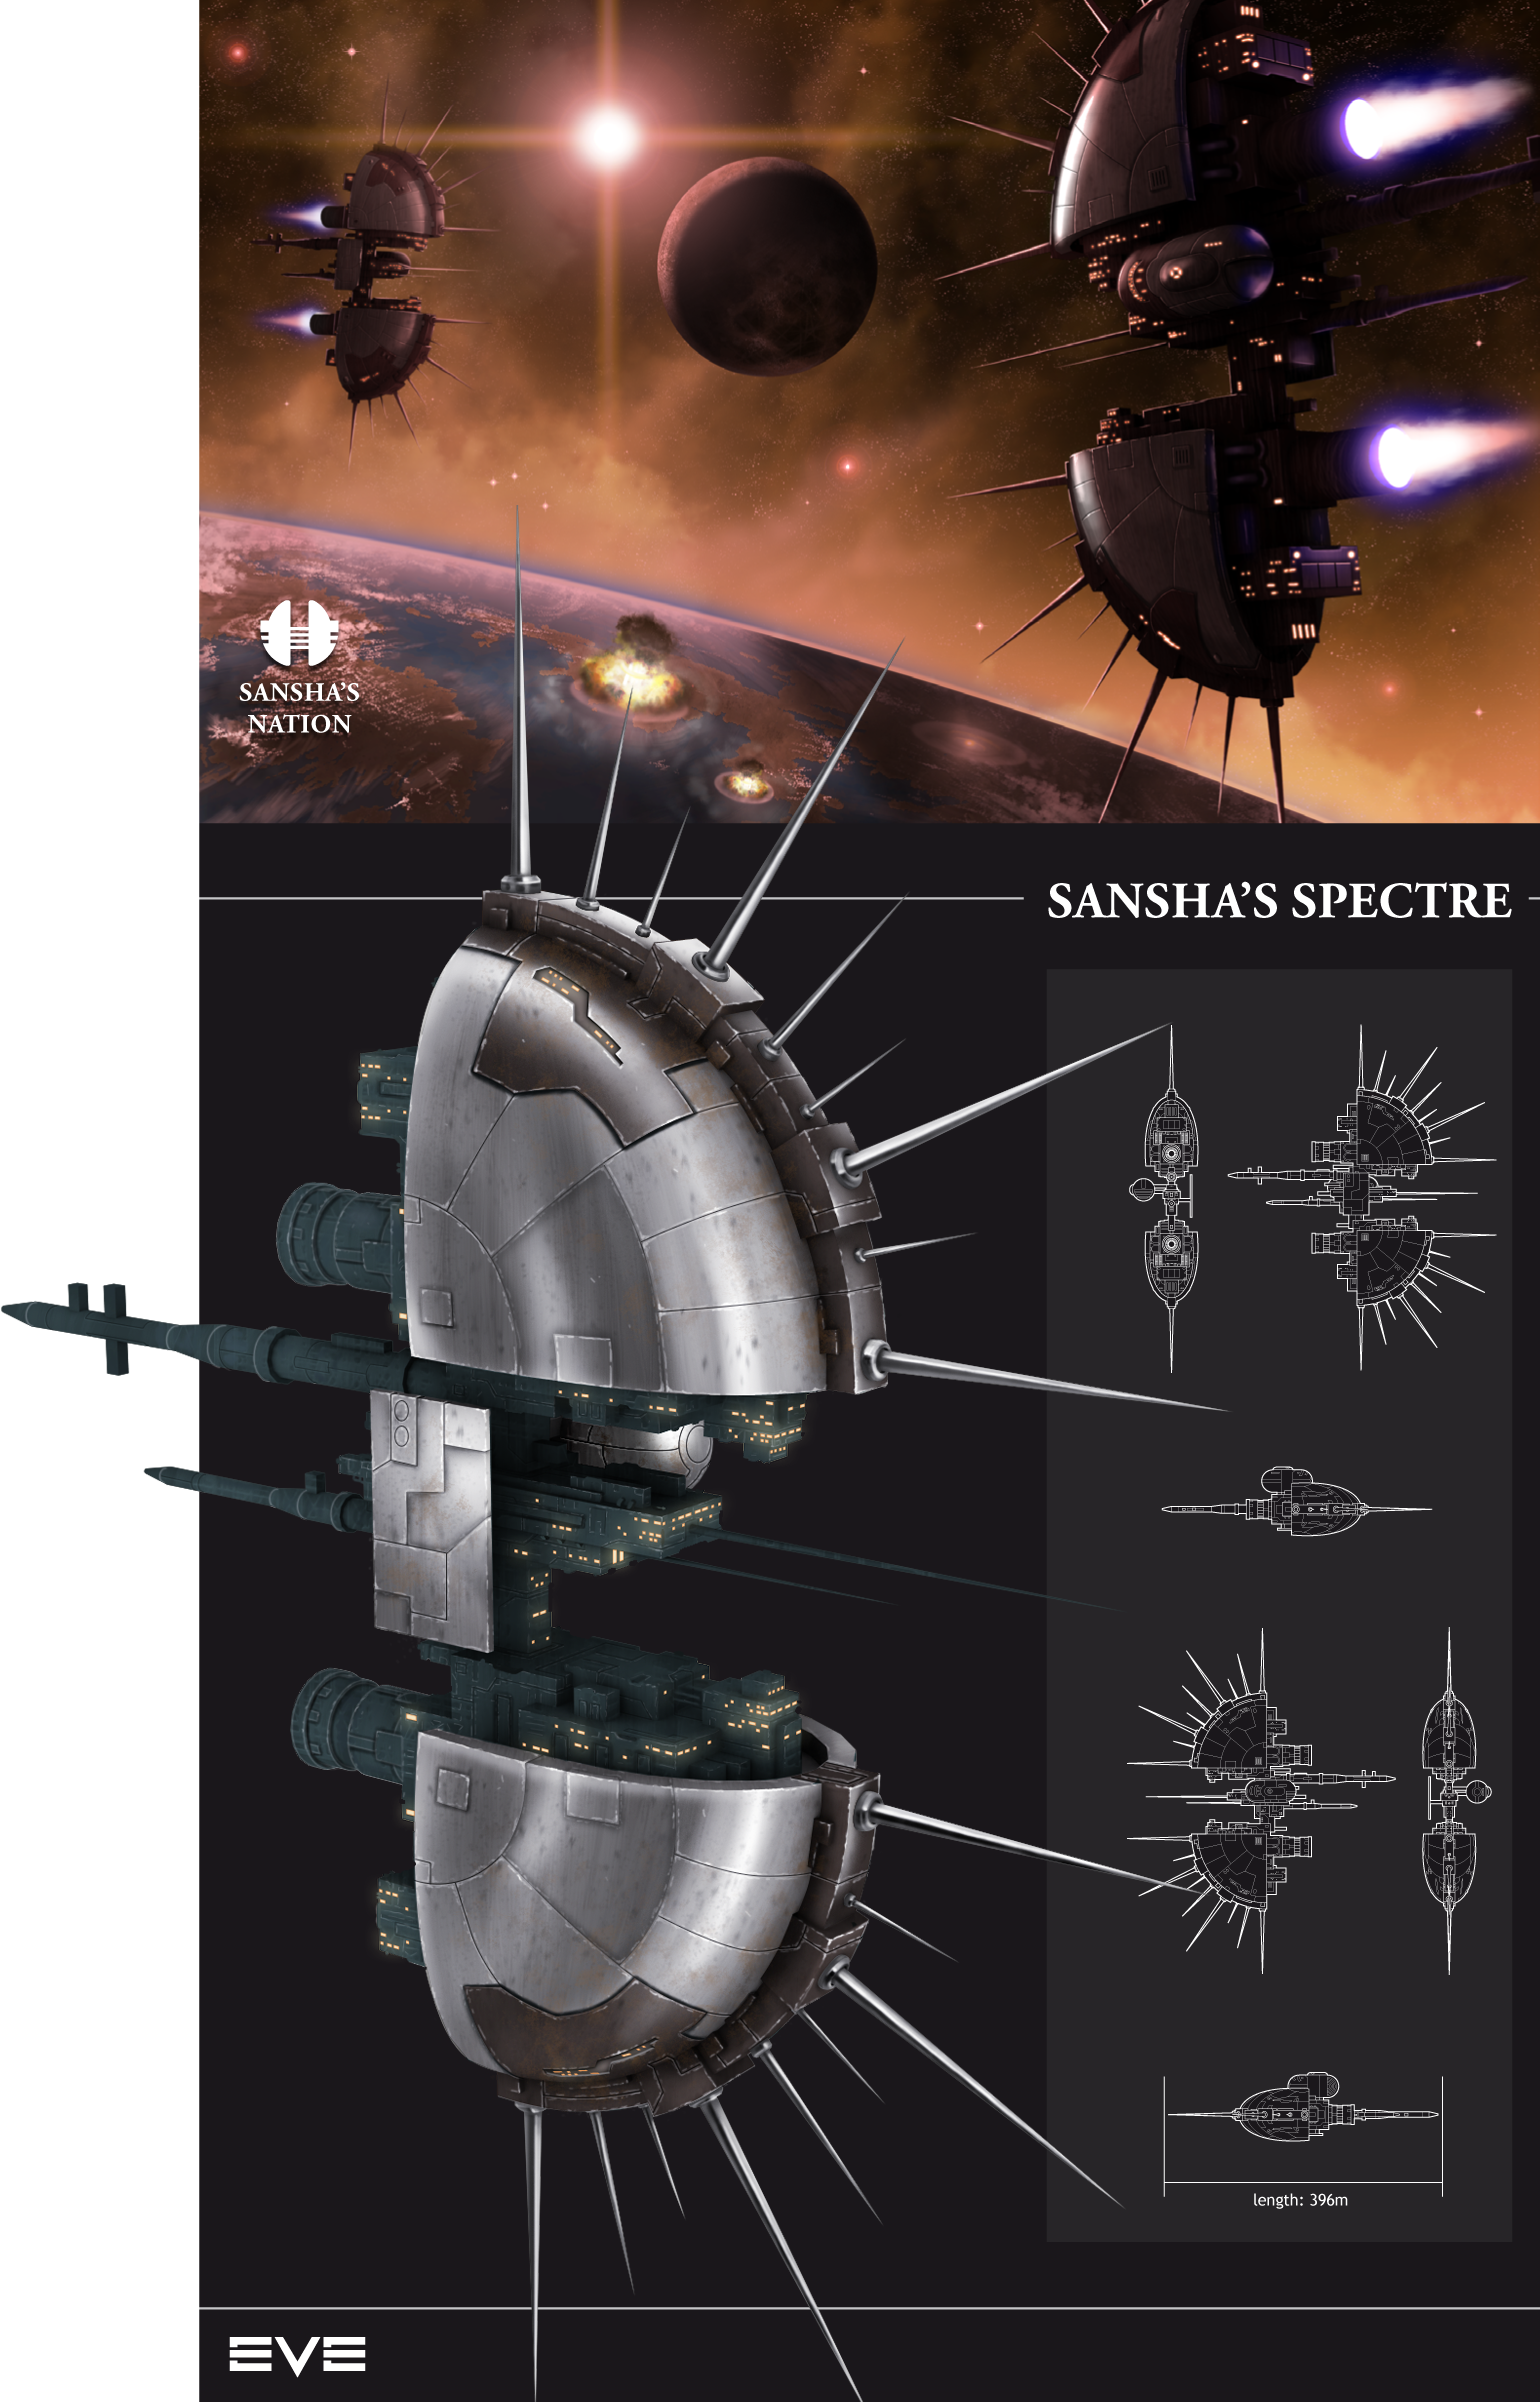 Sansha's Spectre by Krats